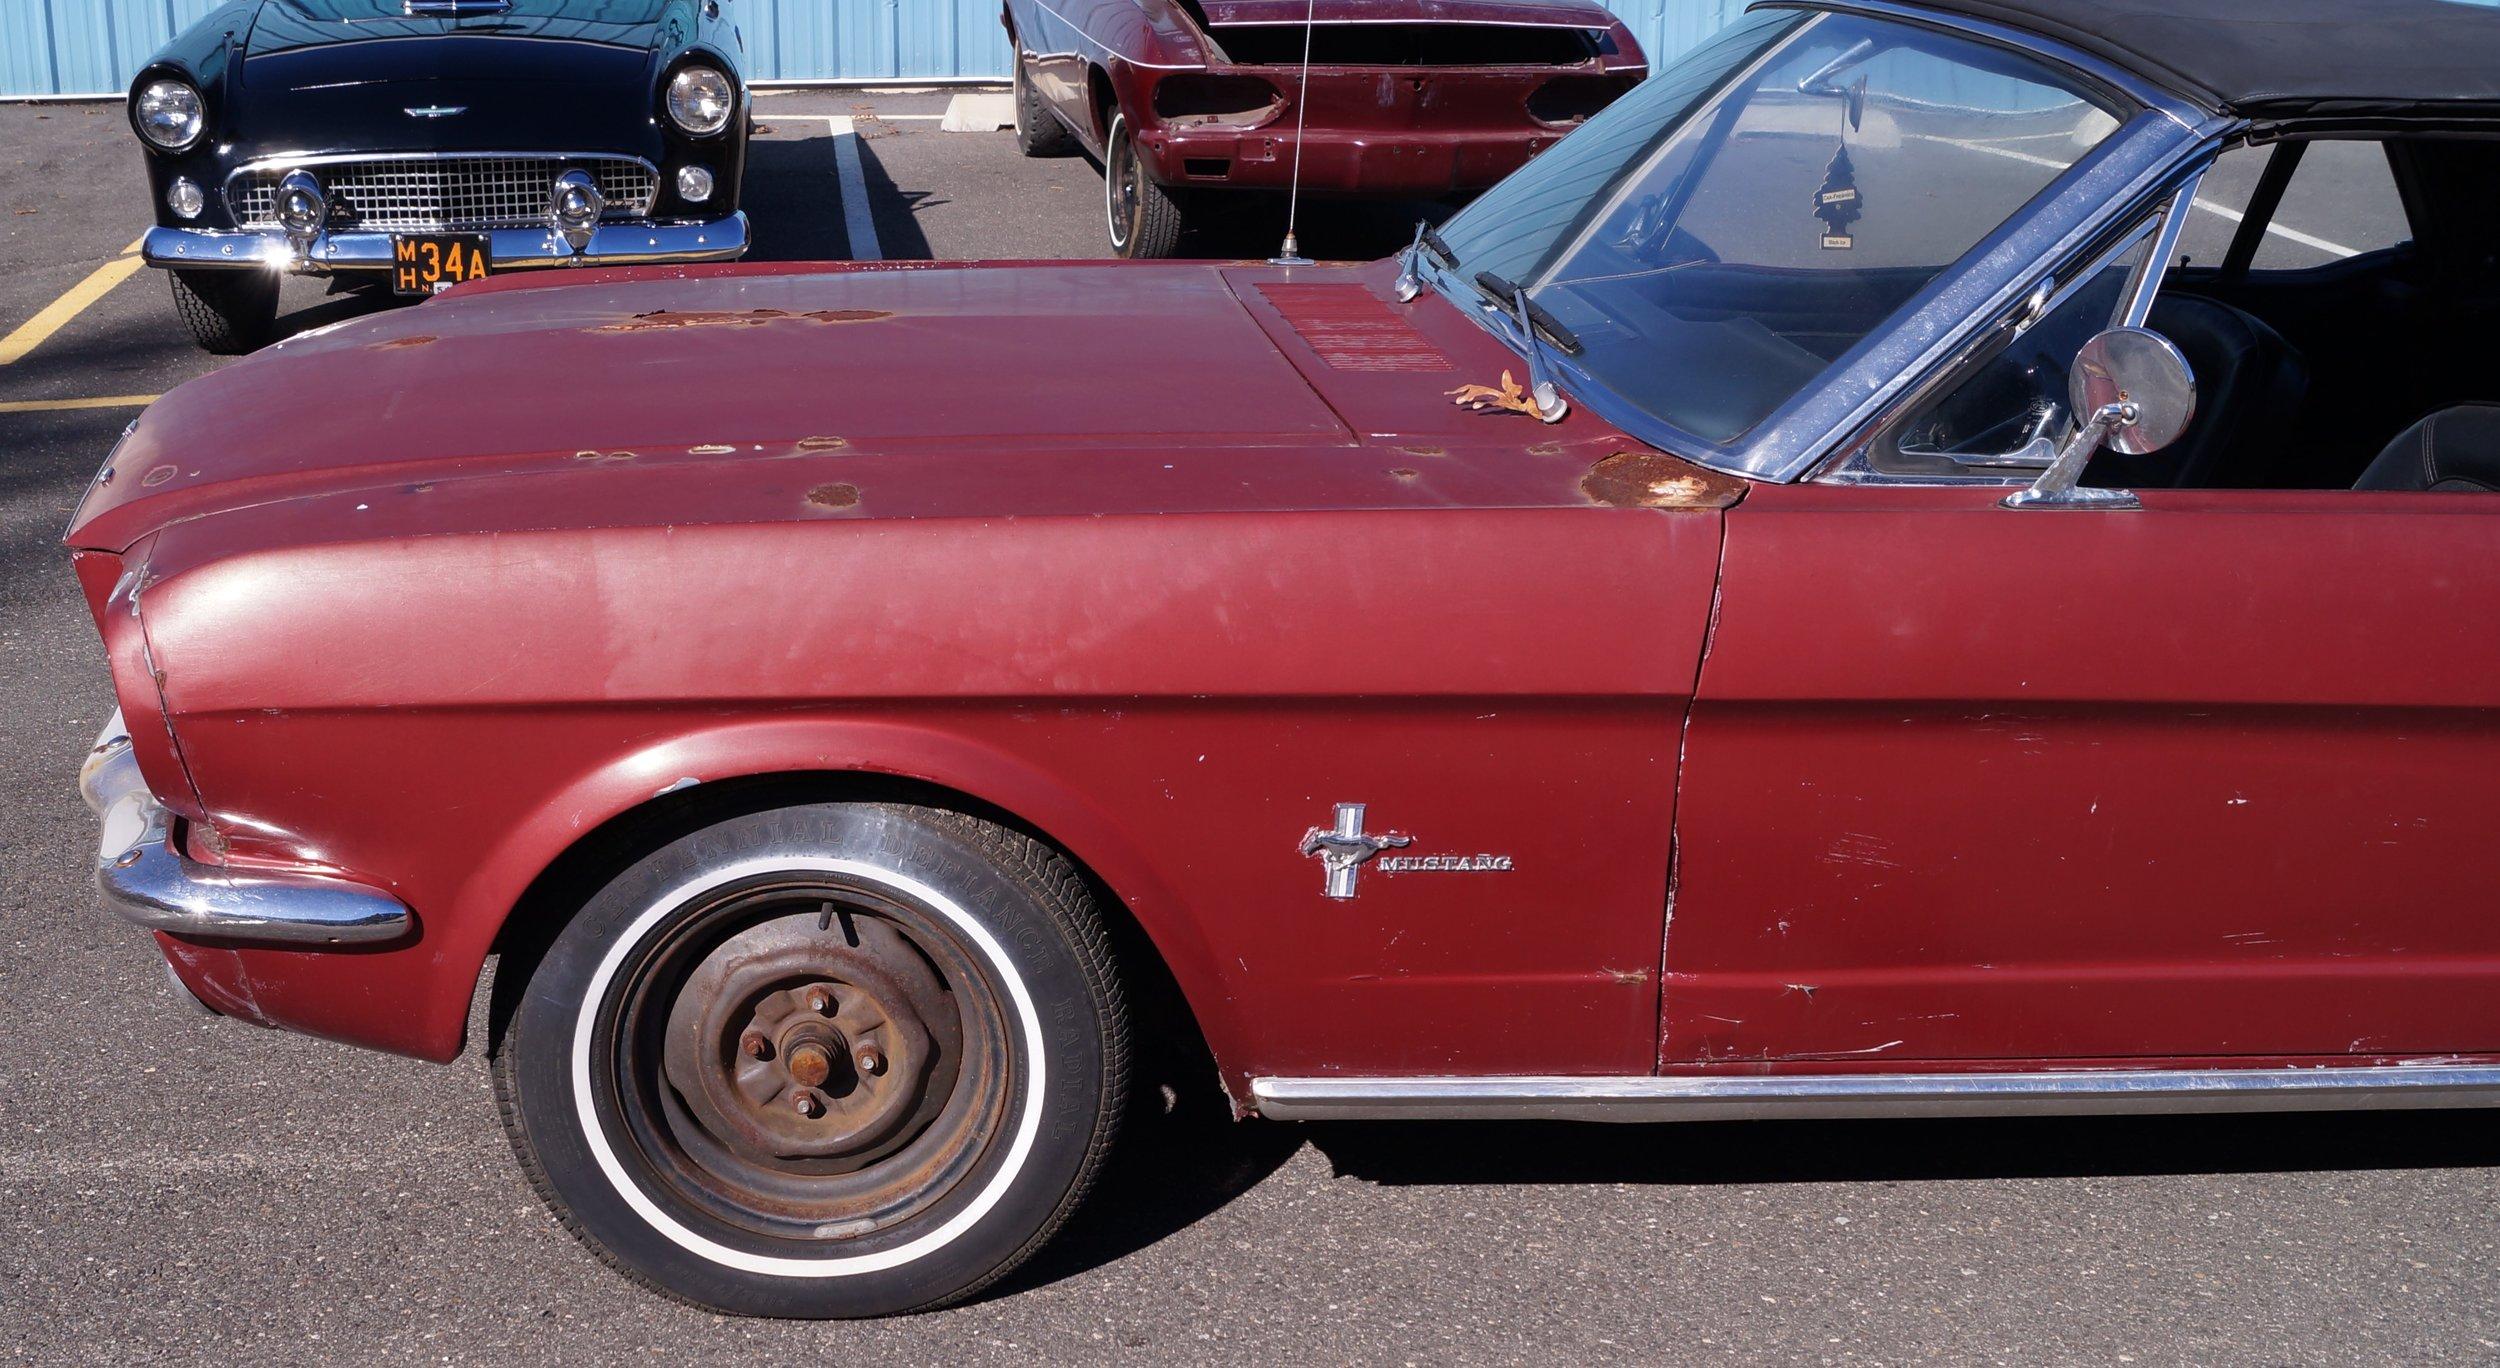 1966 Mustang -- DC 063.jpg